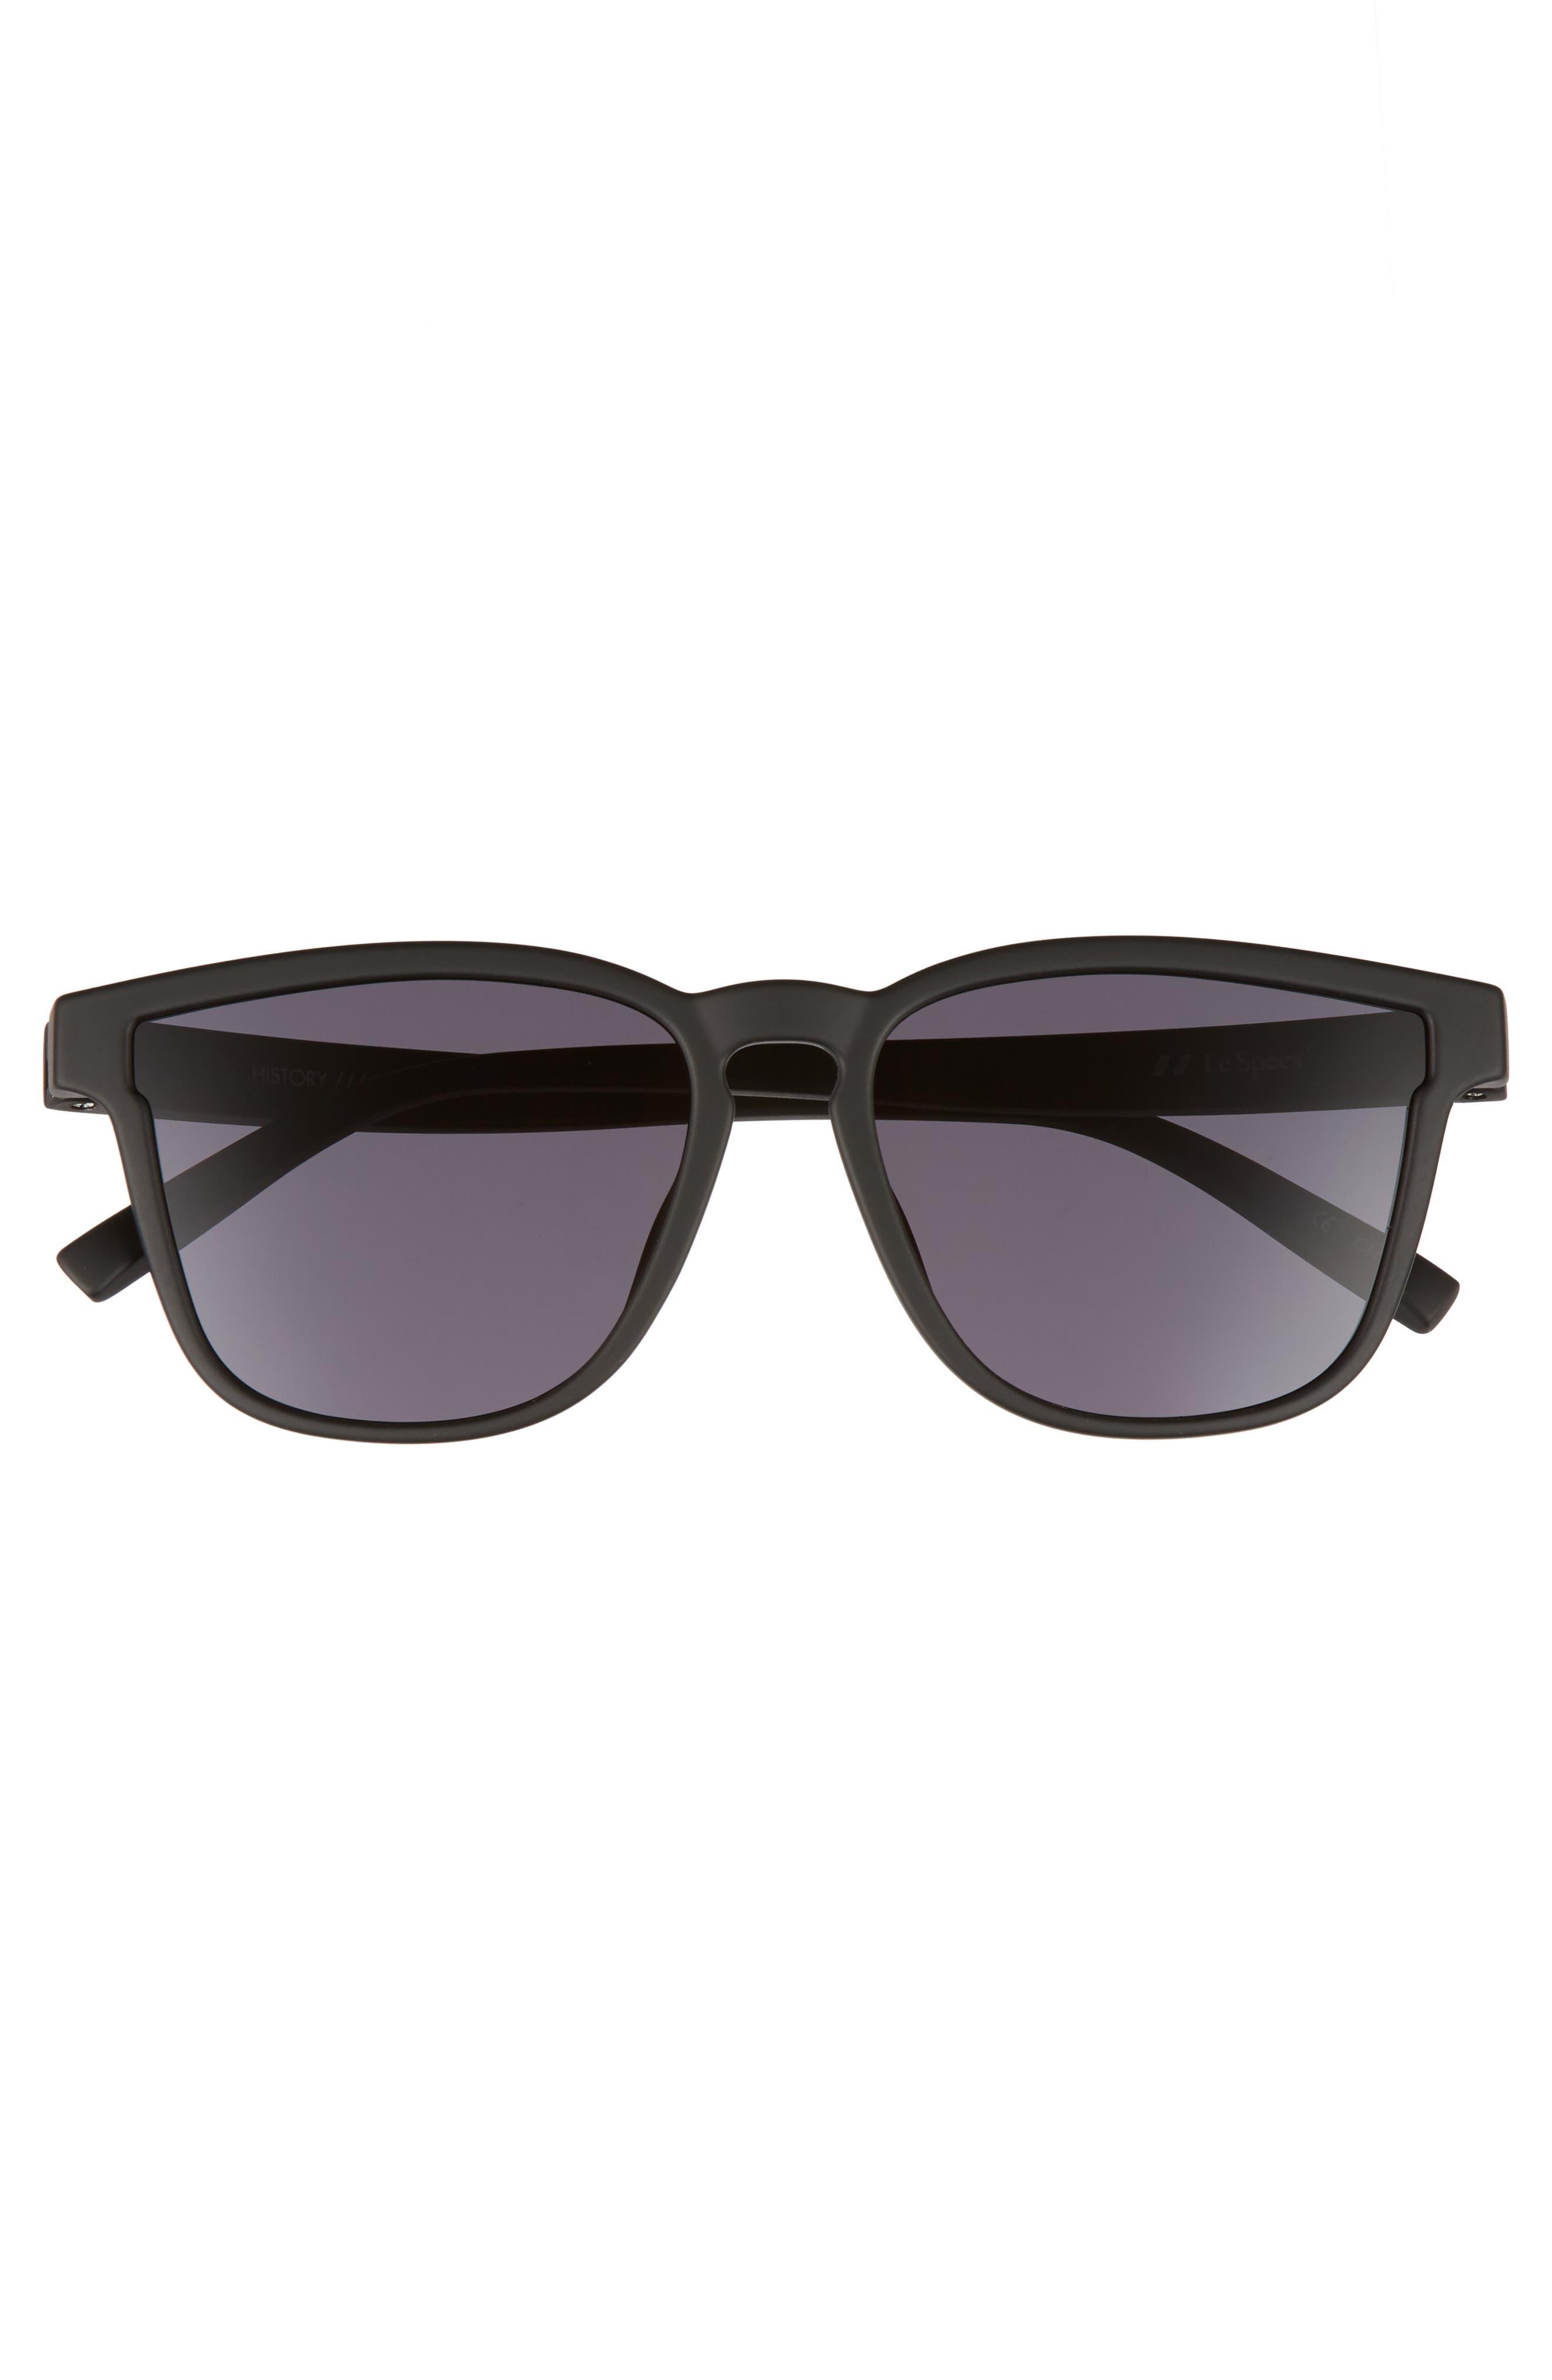 History 53mm Modern Rectangle Sunglasses,                             Alternate thumbnail 3, color,                             BLACK RUBBER